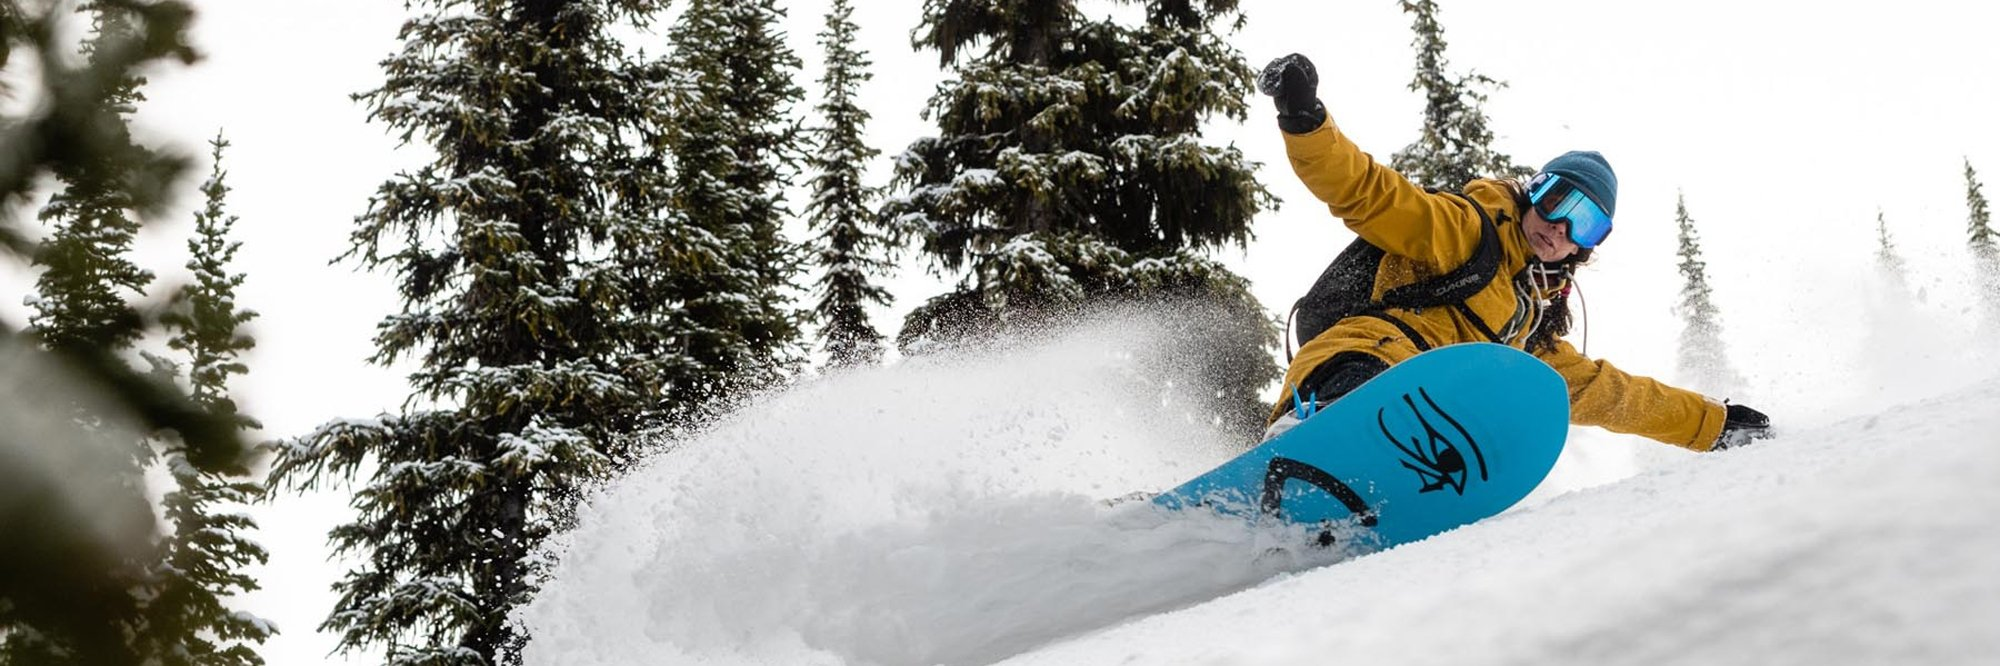 womens snowboards seattle shop